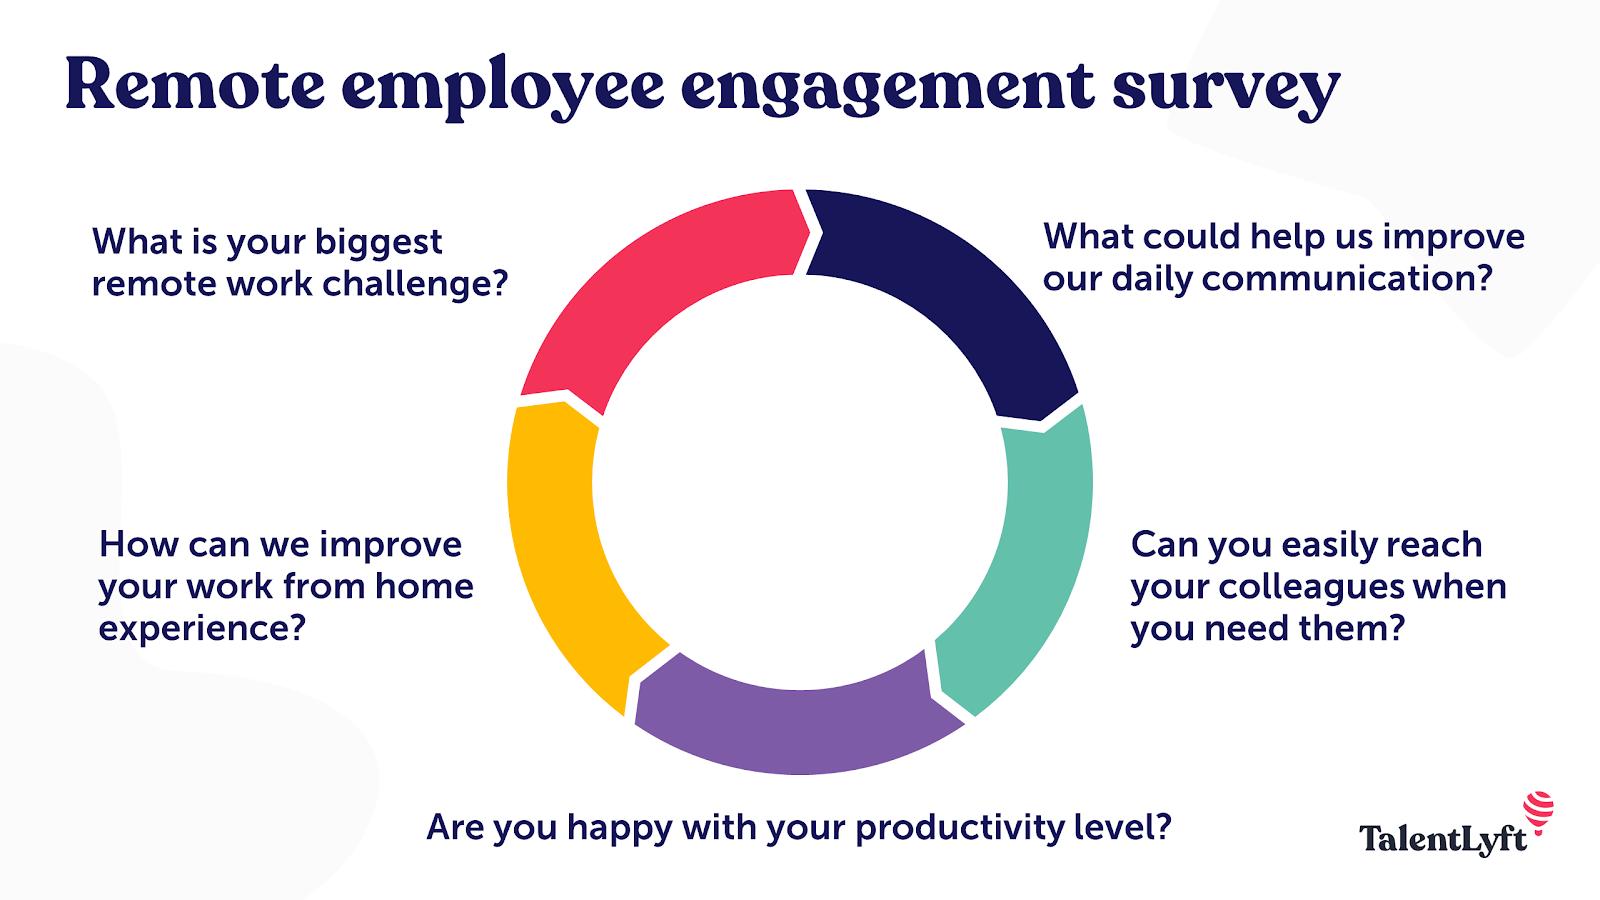 Remote employee engagement survey questions